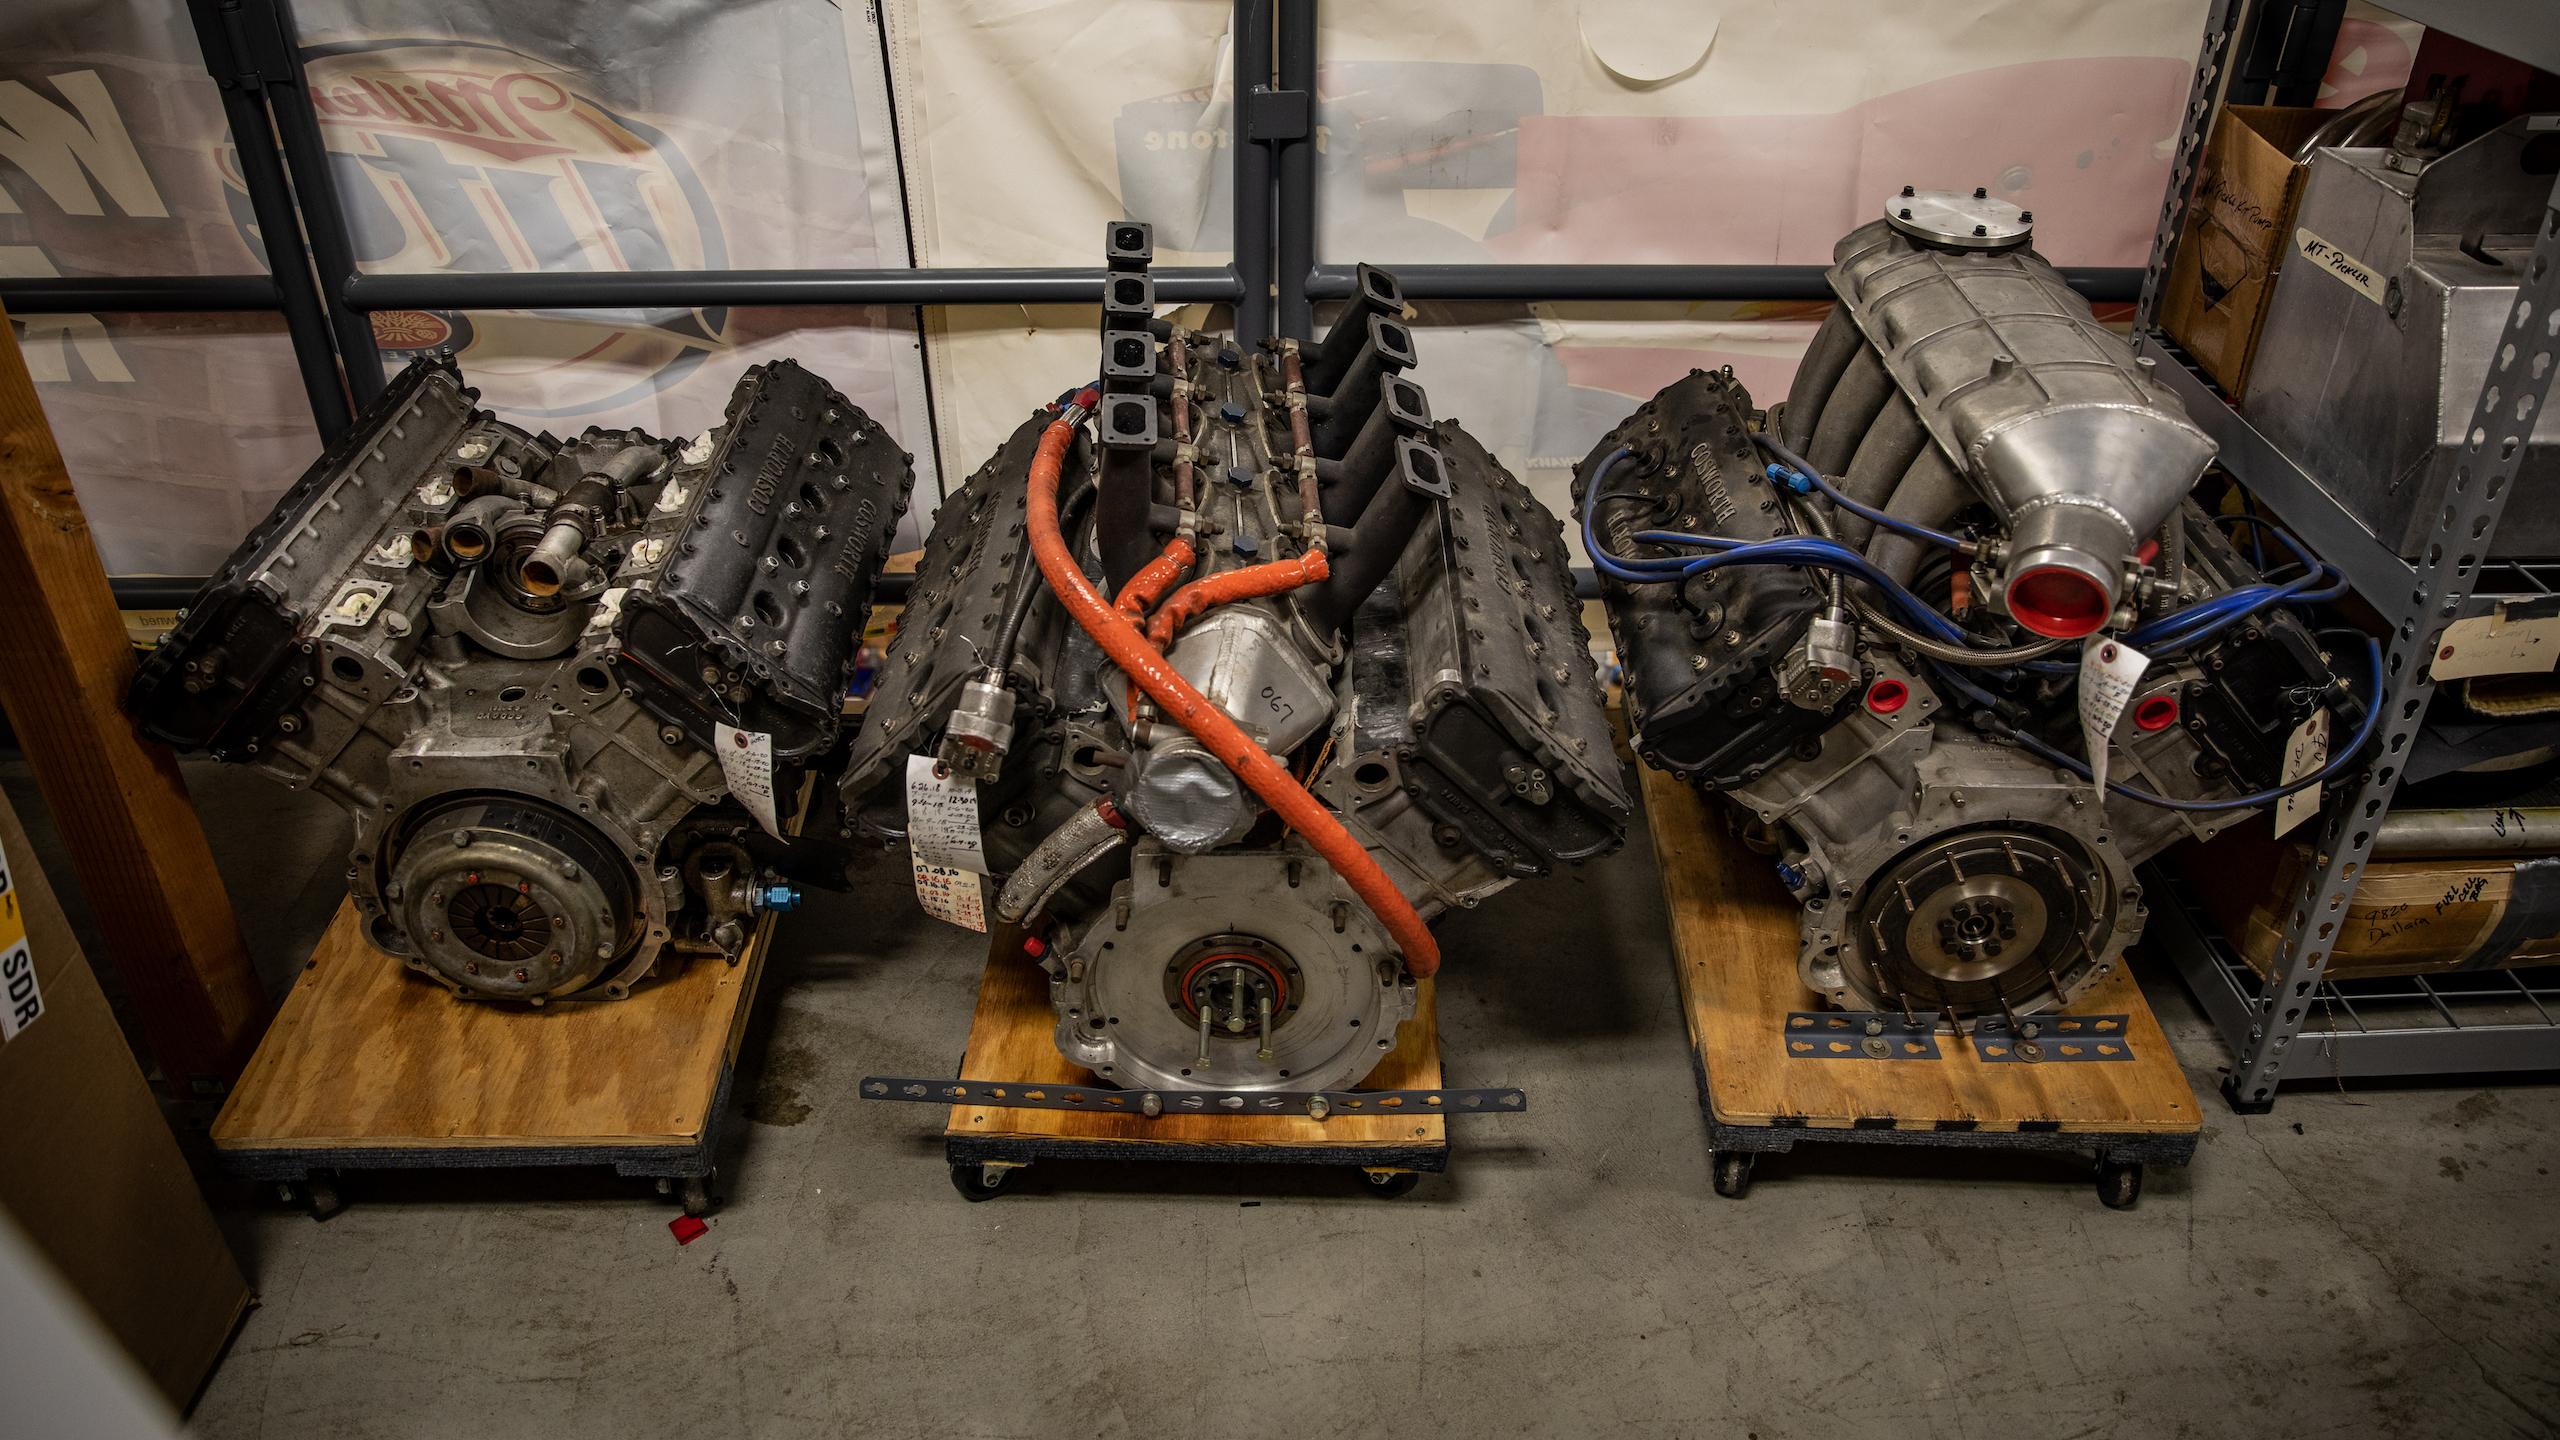 Turn 4 Restorations engines